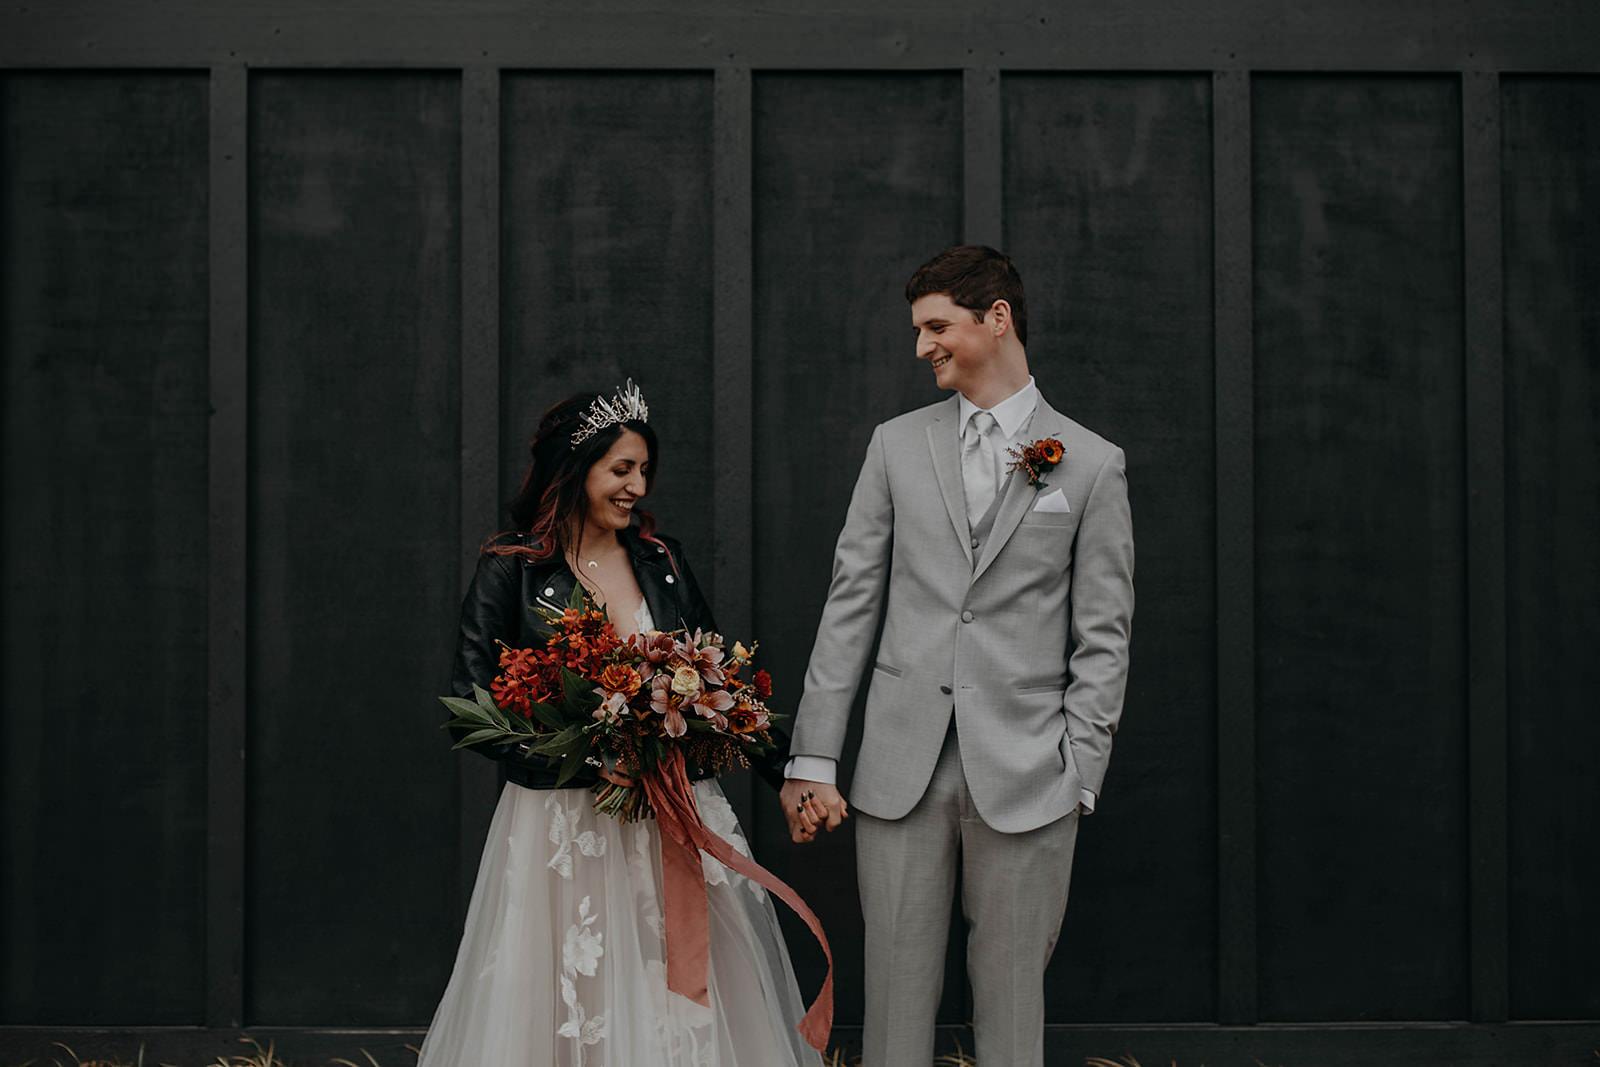 witchy-winter-wedding-bre-smo-at-oak-grove-jorgensen-farm-wedding-columbus-ohio-grace-e-jones-photography154.jpg